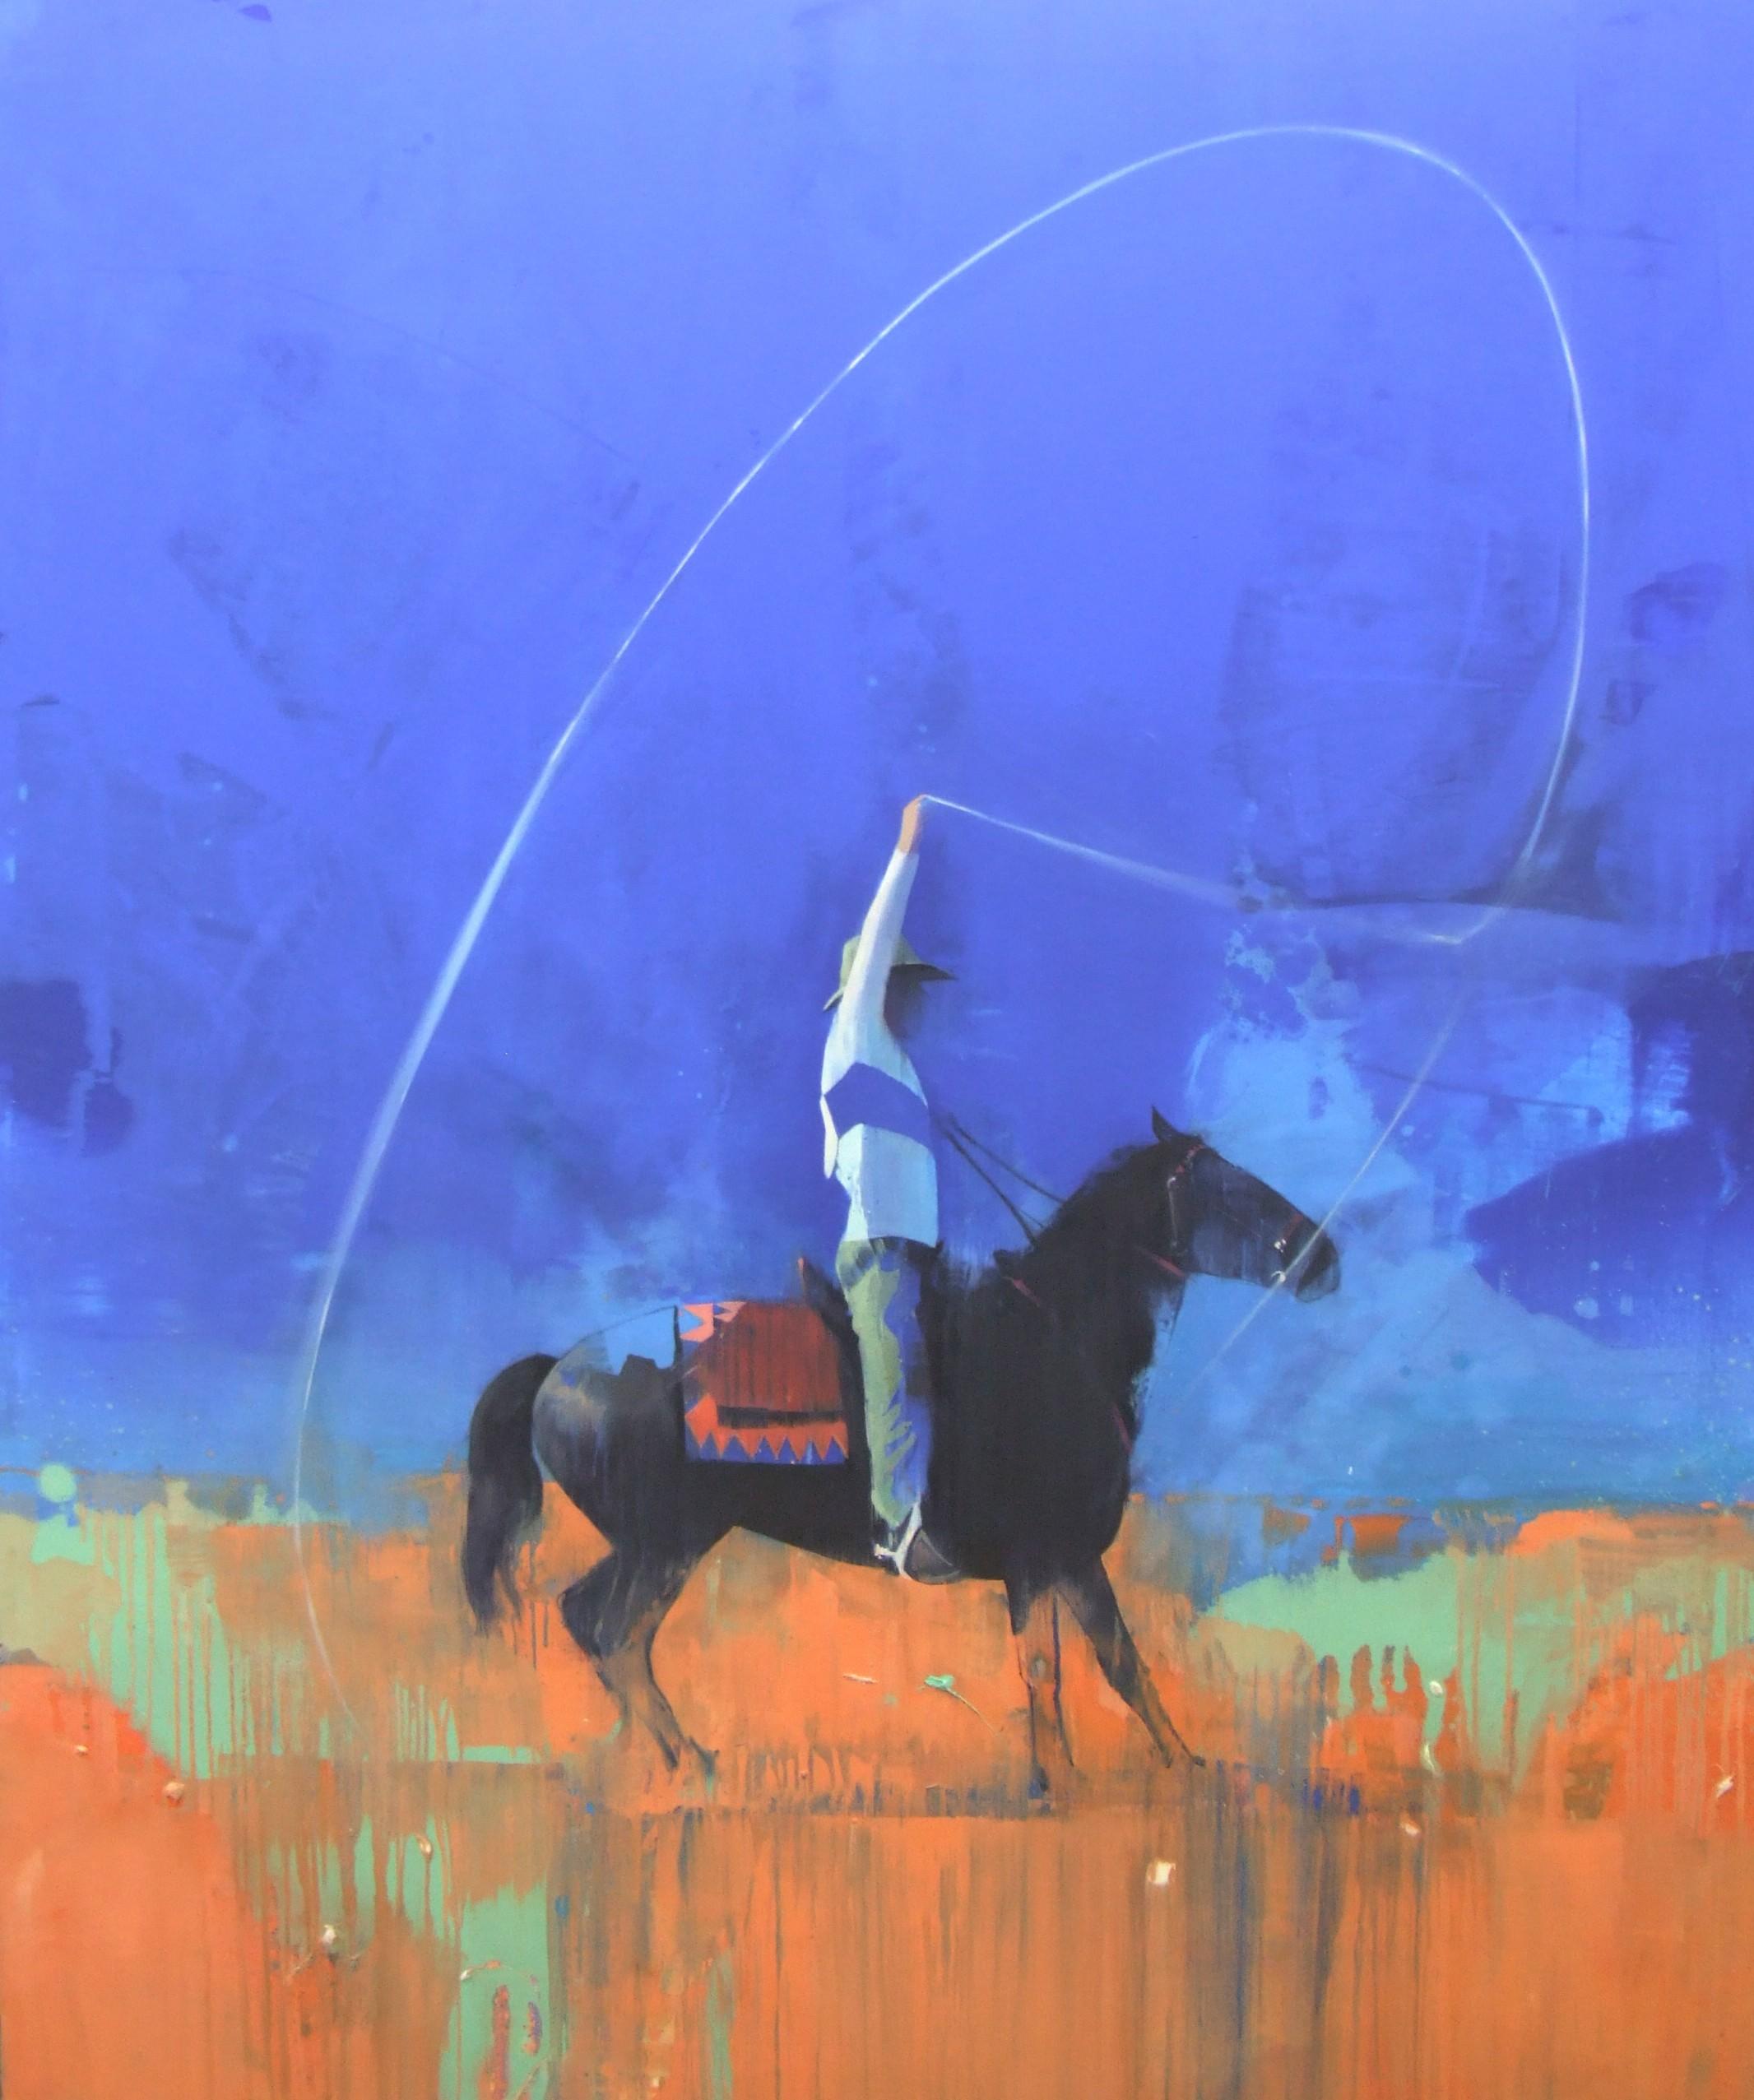 Fancy rope tricks 183 x 152 cm oil on canvas